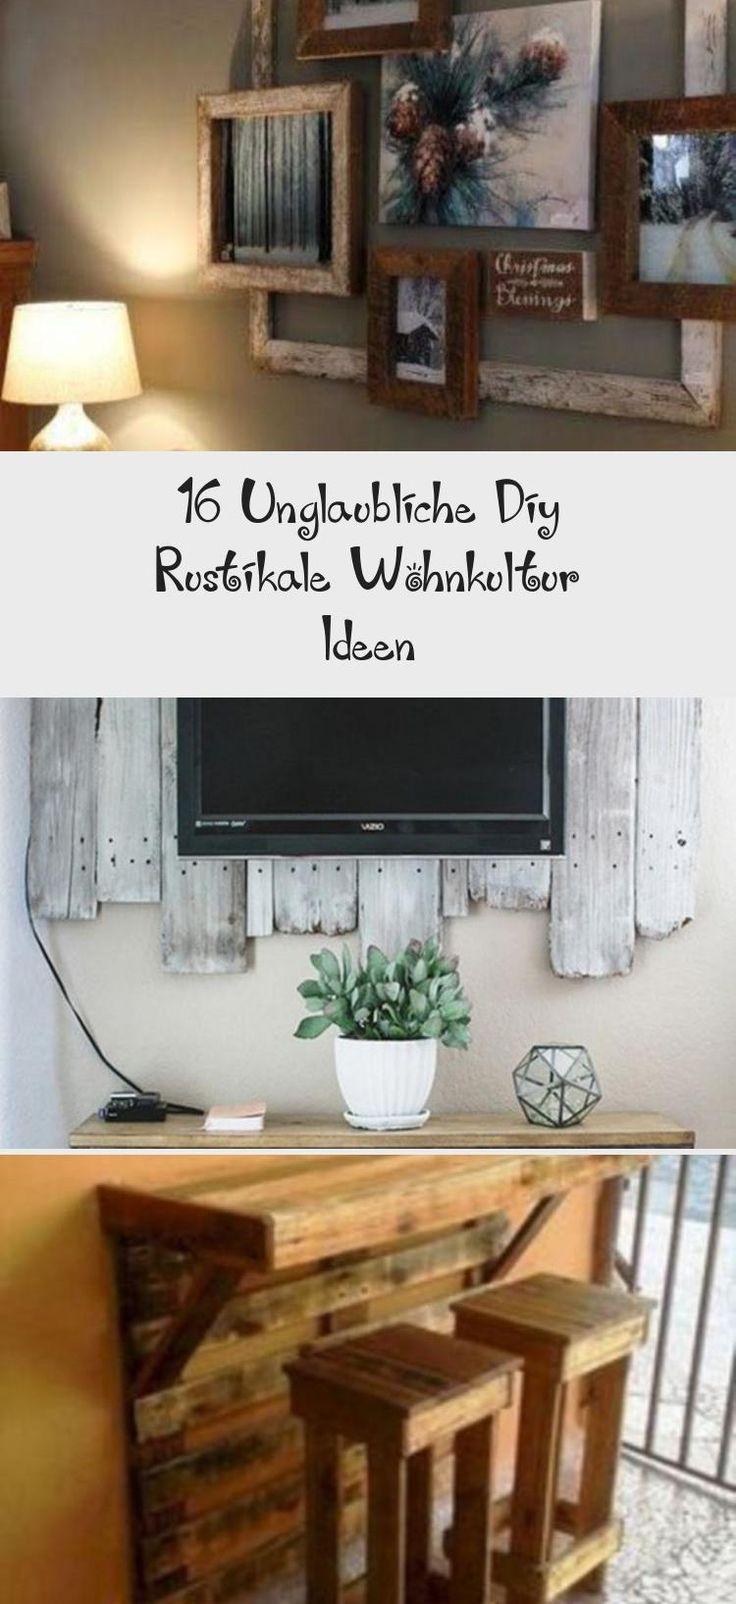 16 unglaubliche DIY rustikale Wohnkultur Ideen #Wohnkultur ...